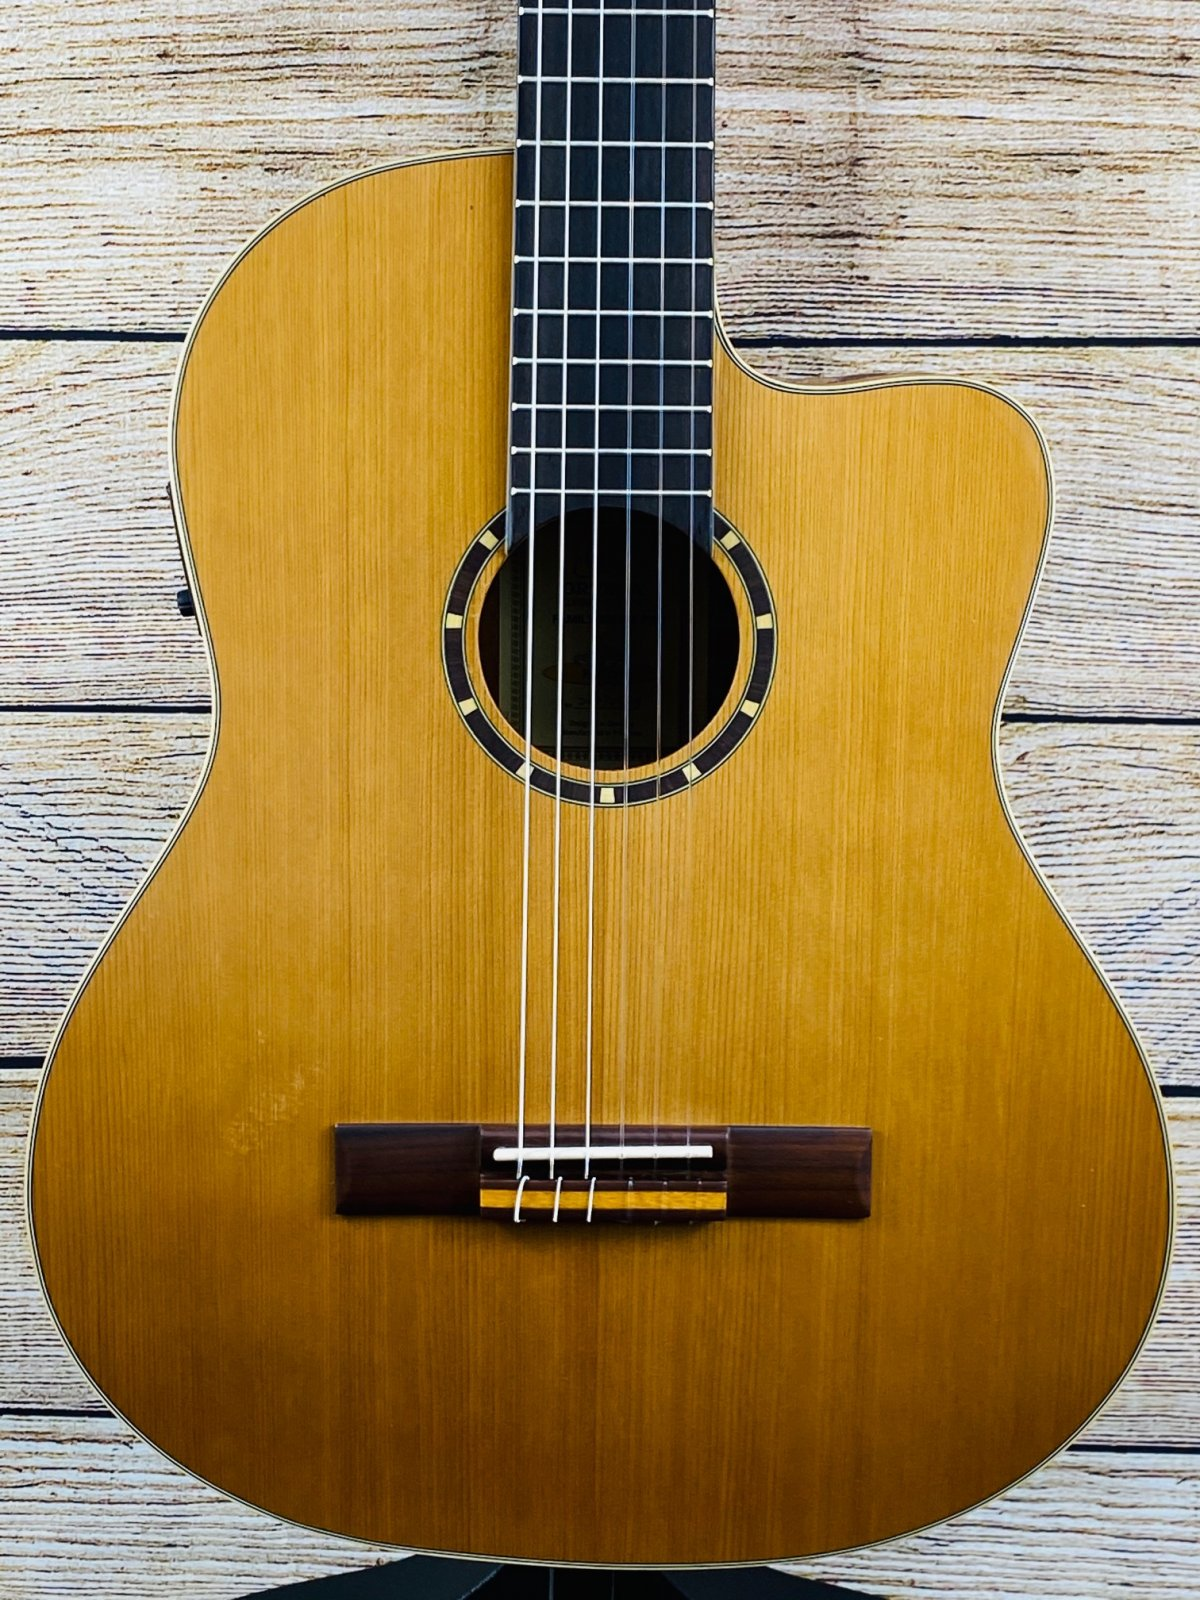 Ortega Family Series Pro RCE131 Acoustic-Electric Classical Guitar Satin Natural